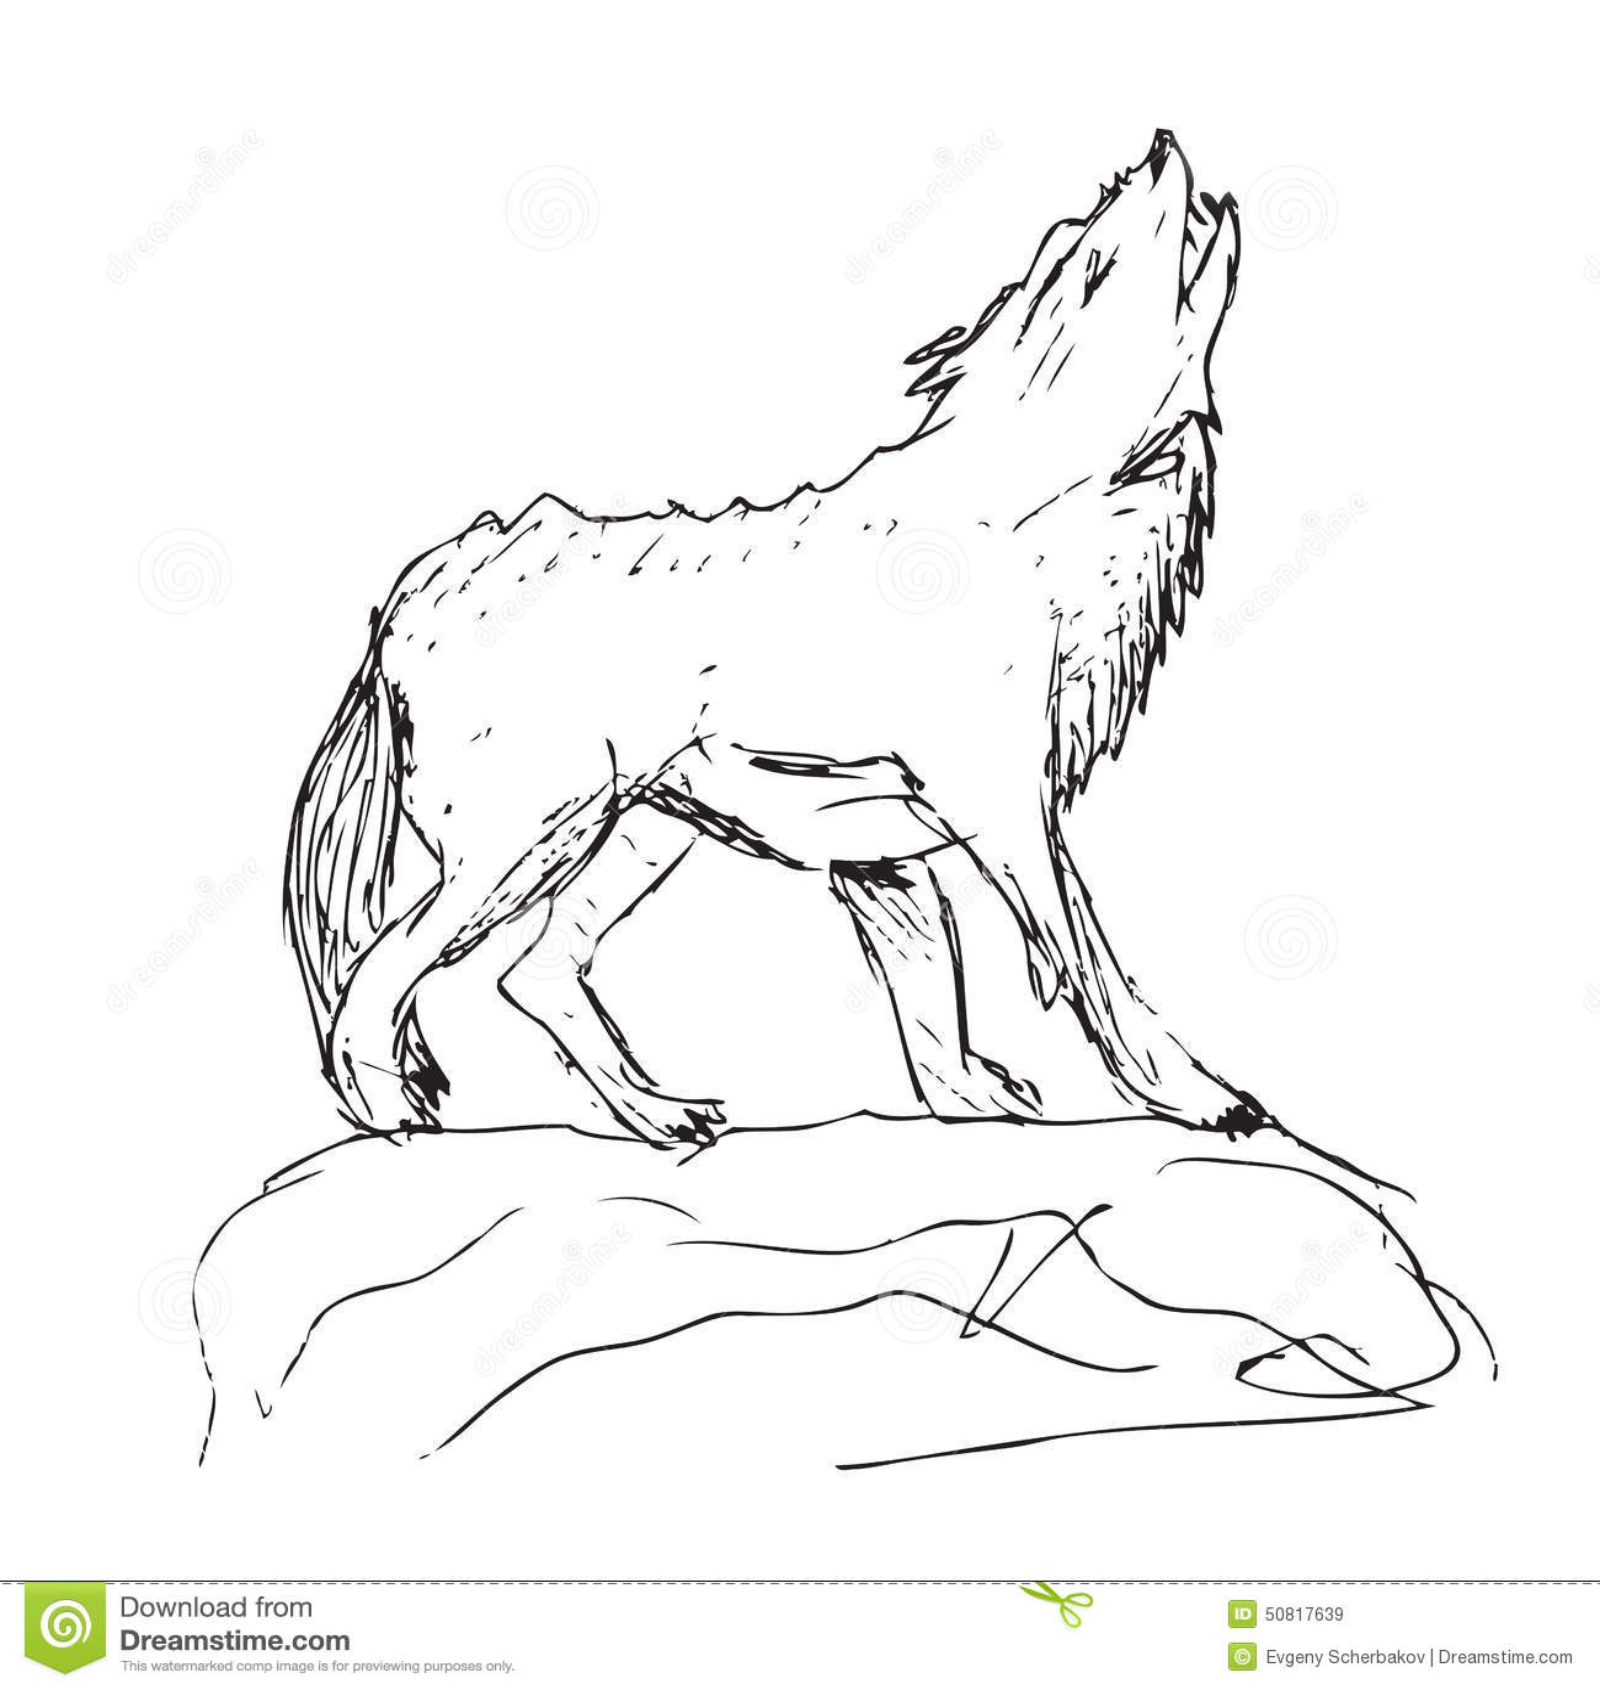 Dessin d 39 un grand loup illustration stock image 50817639 - Un loup dessin ...